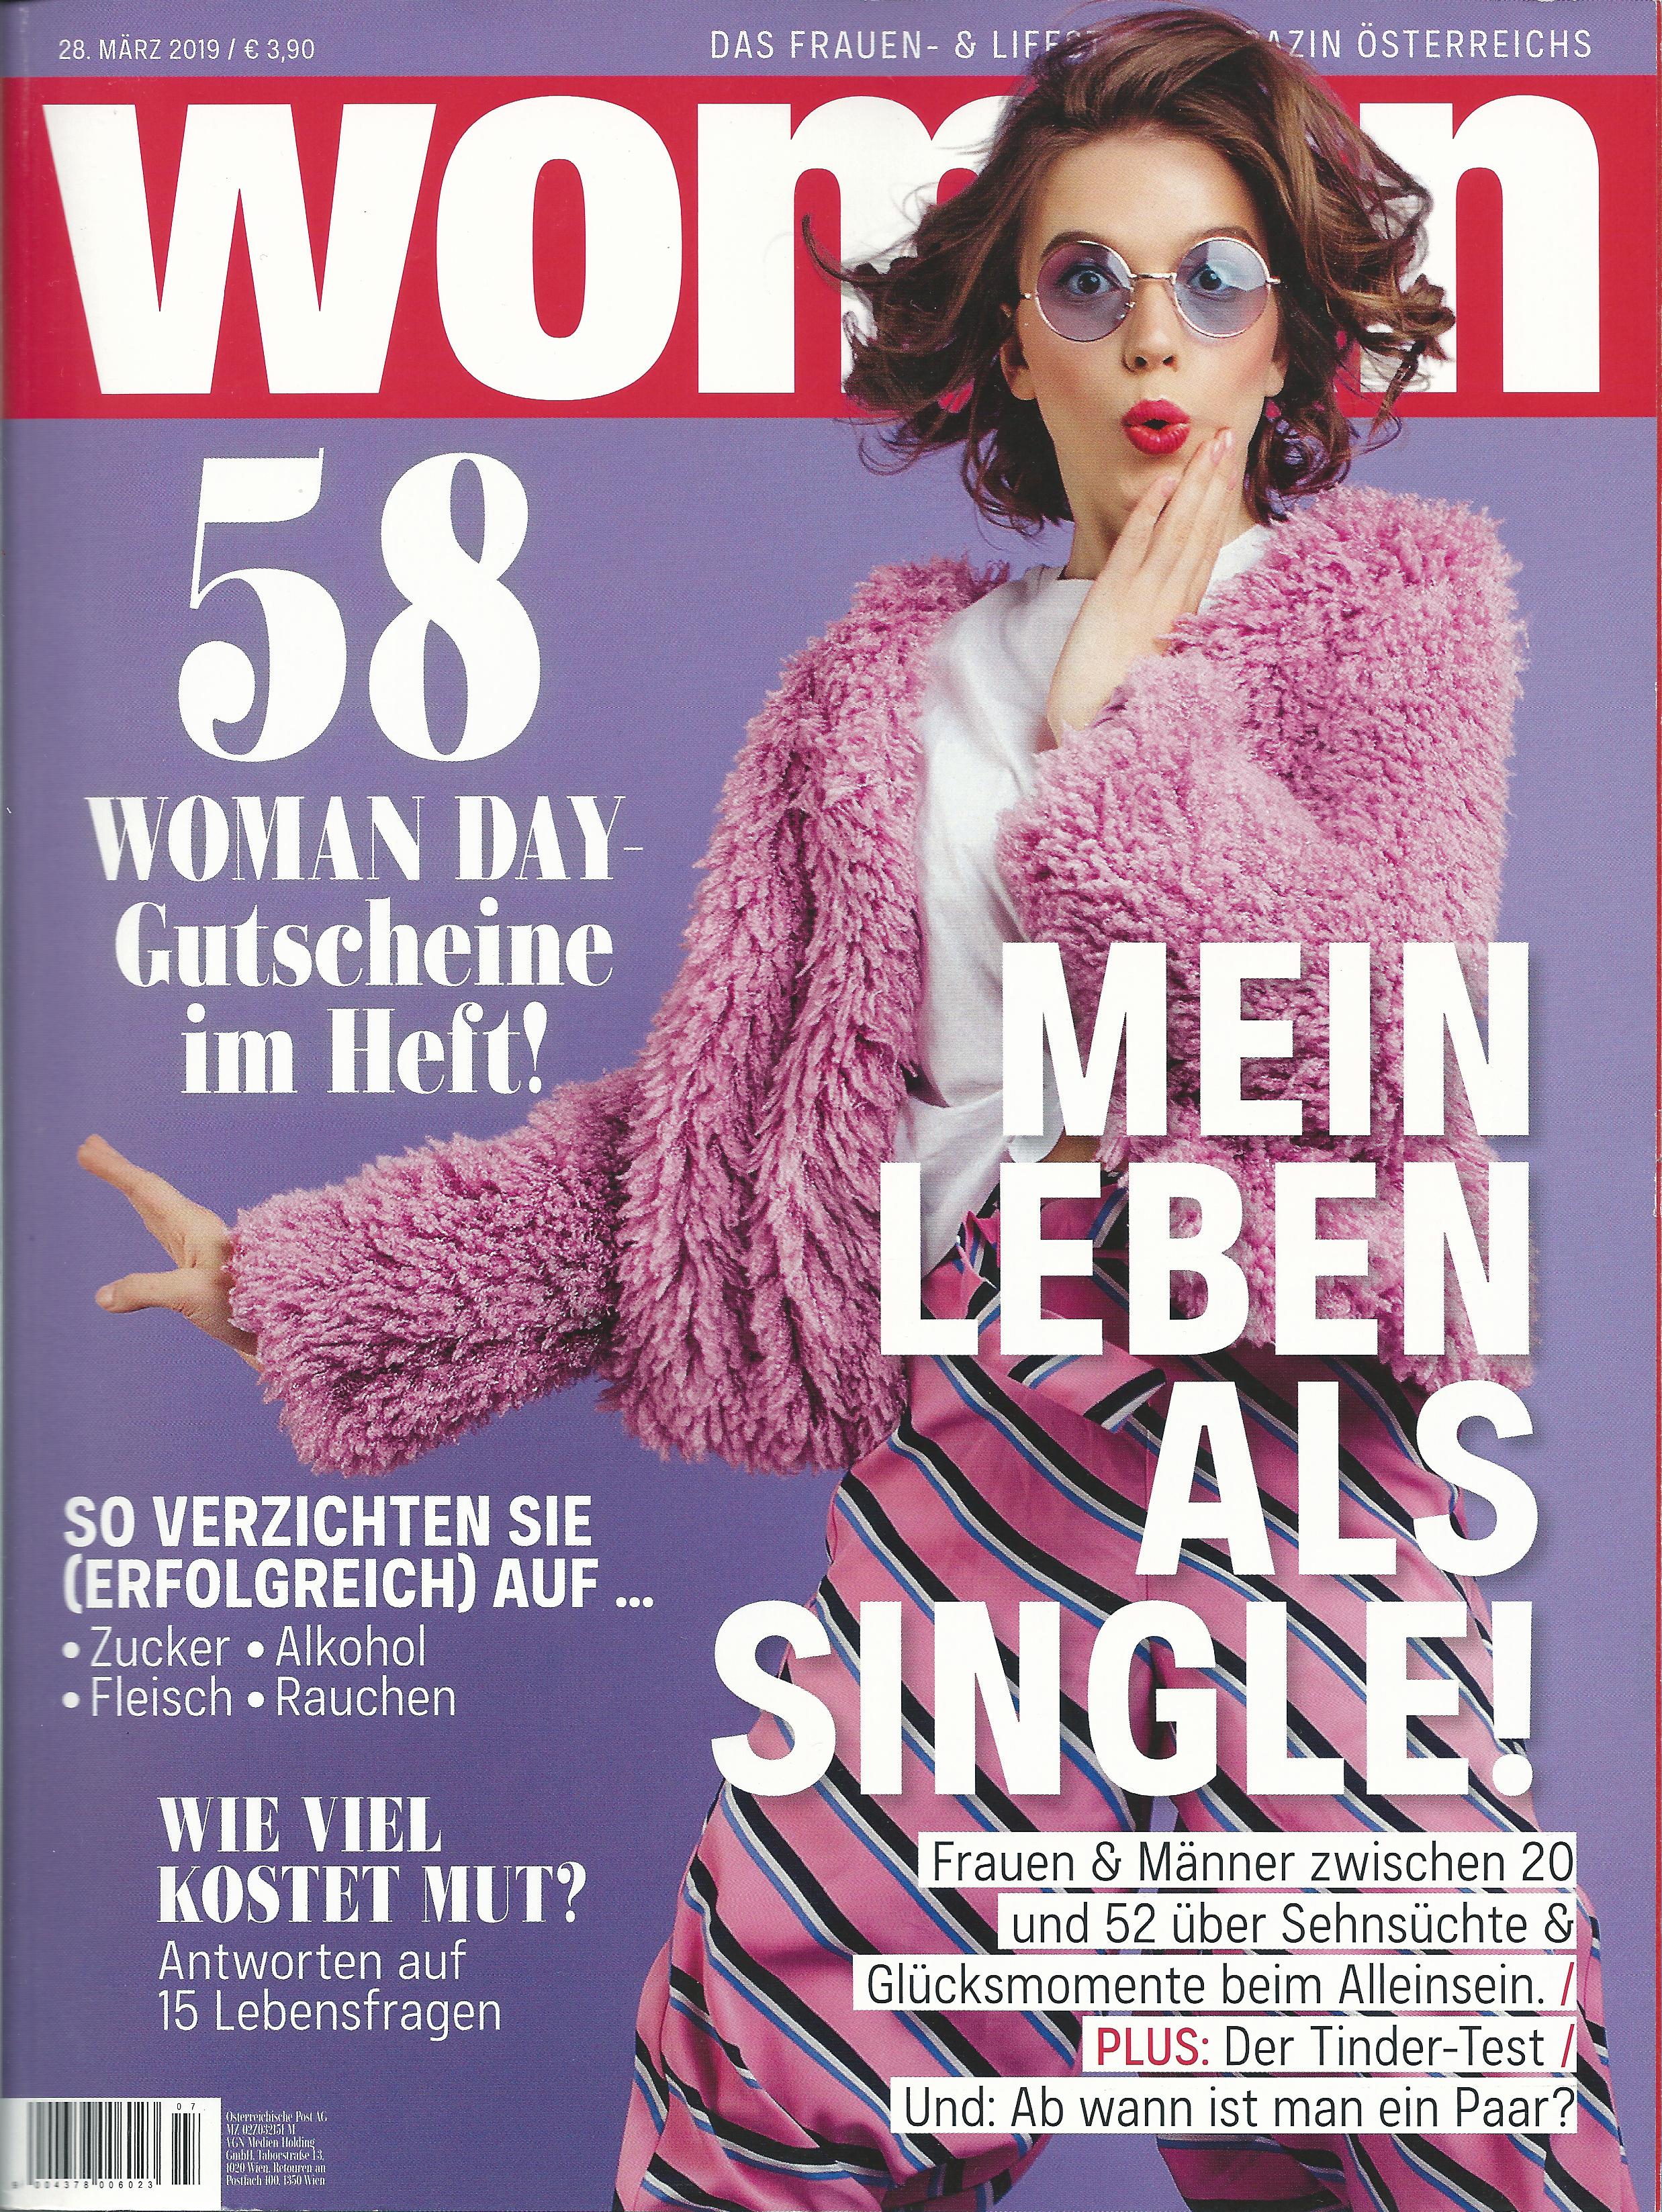 Eva Fischer: Singleexpertin in der Titelstory der Woman